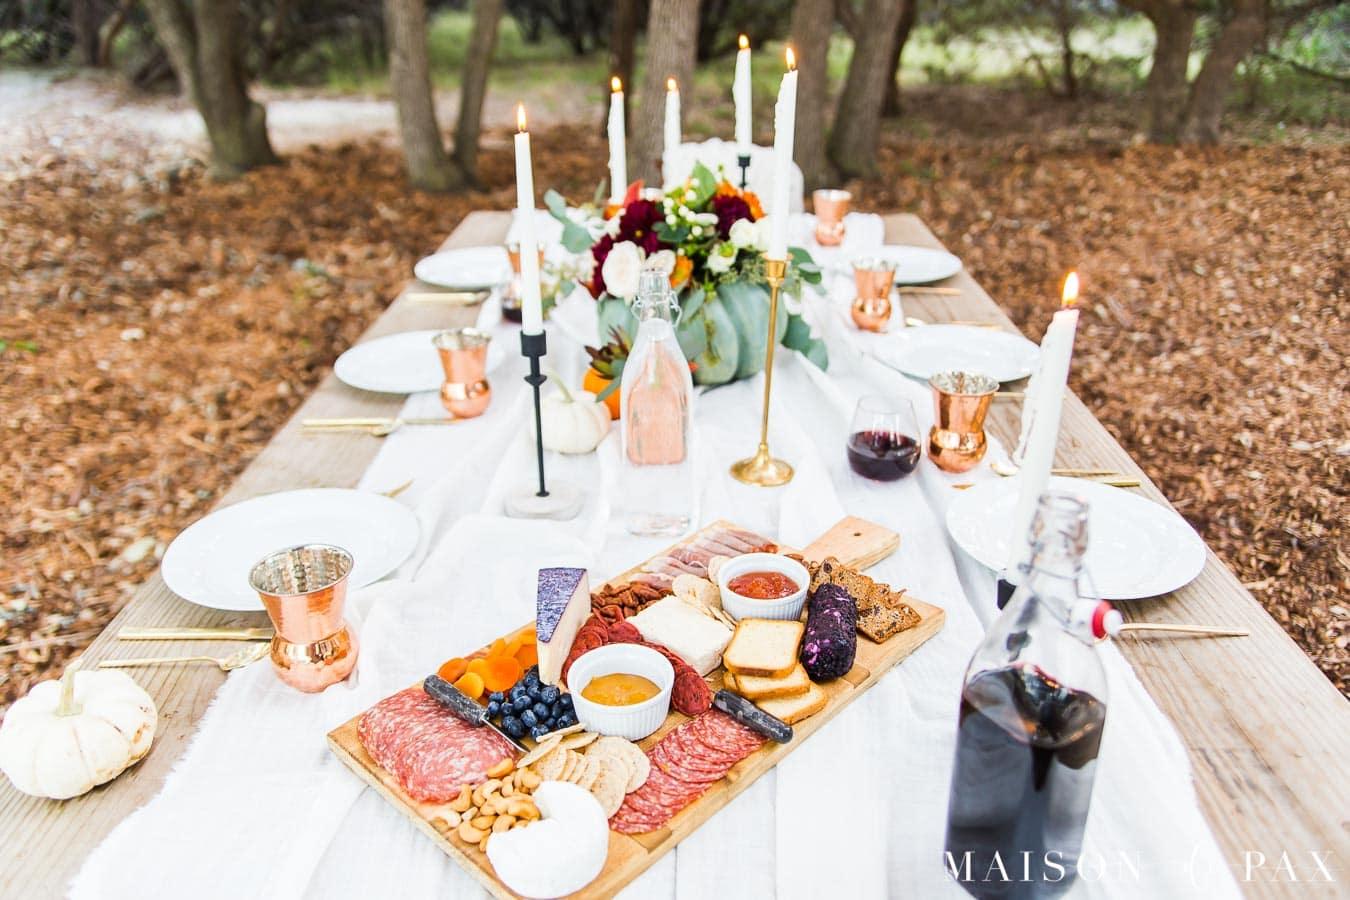 friendsgiving ideas: charcuterie board on thanksgiving table | Maison de Pax